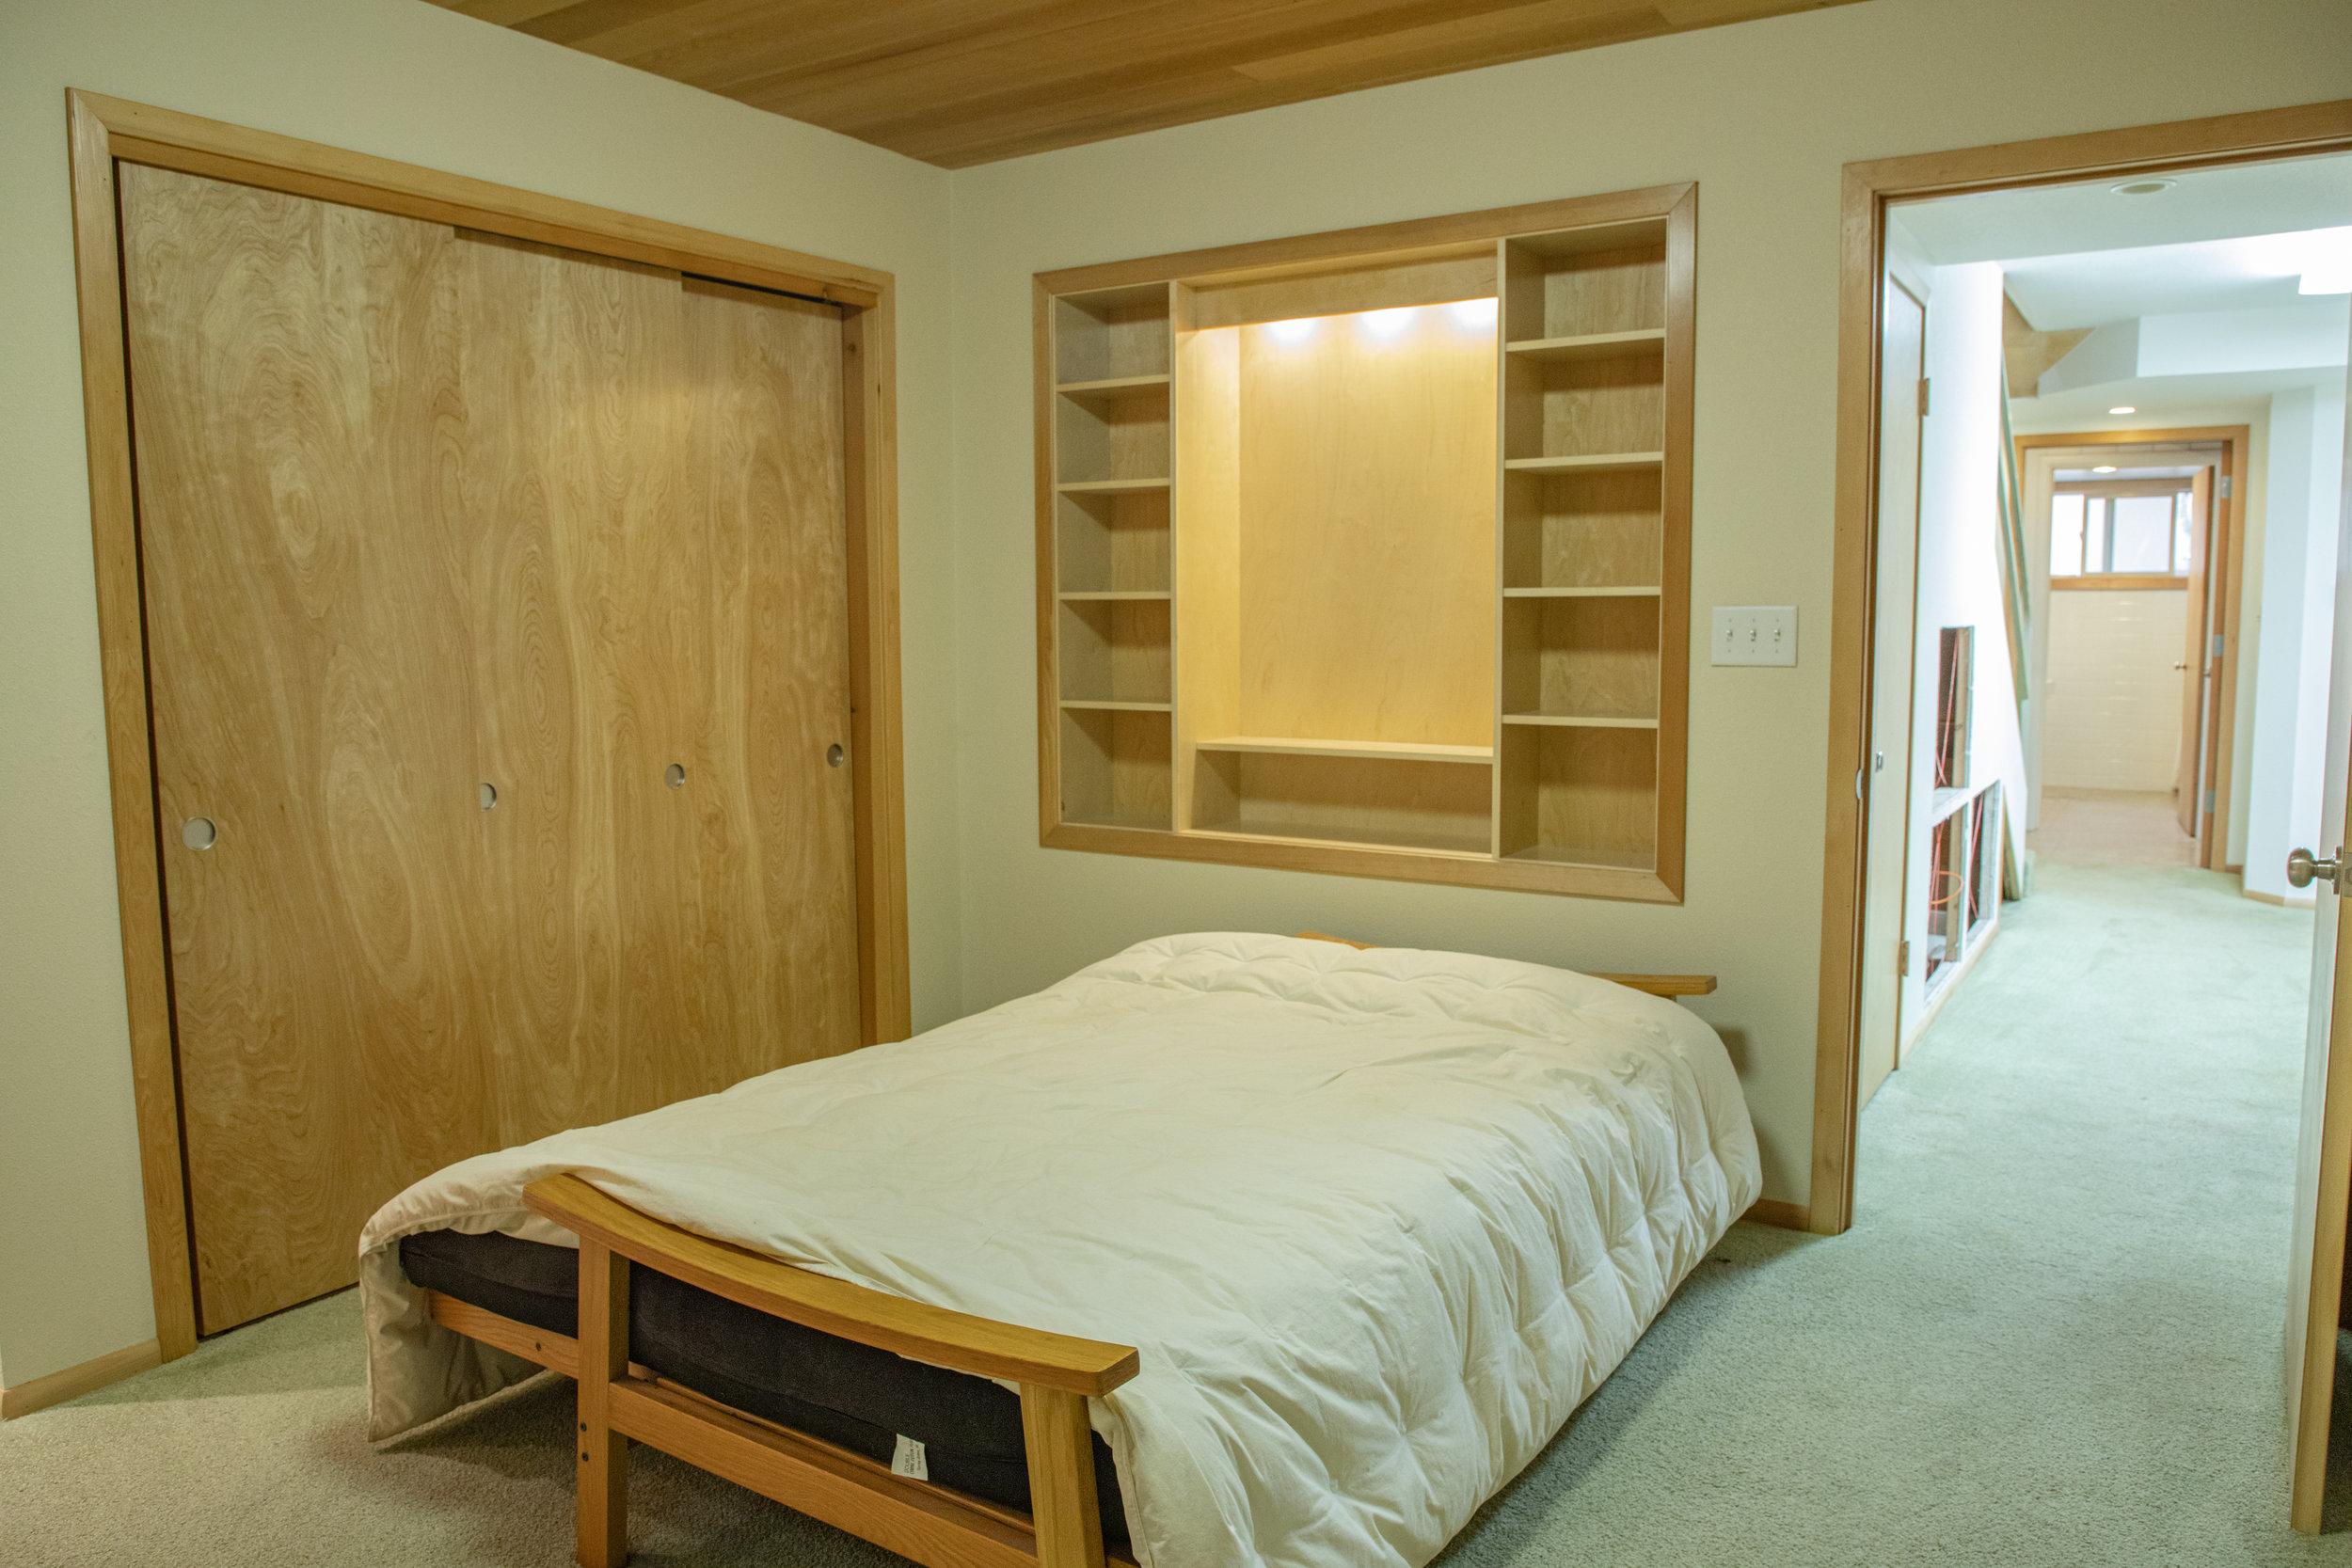 4thbedroom2.jpg